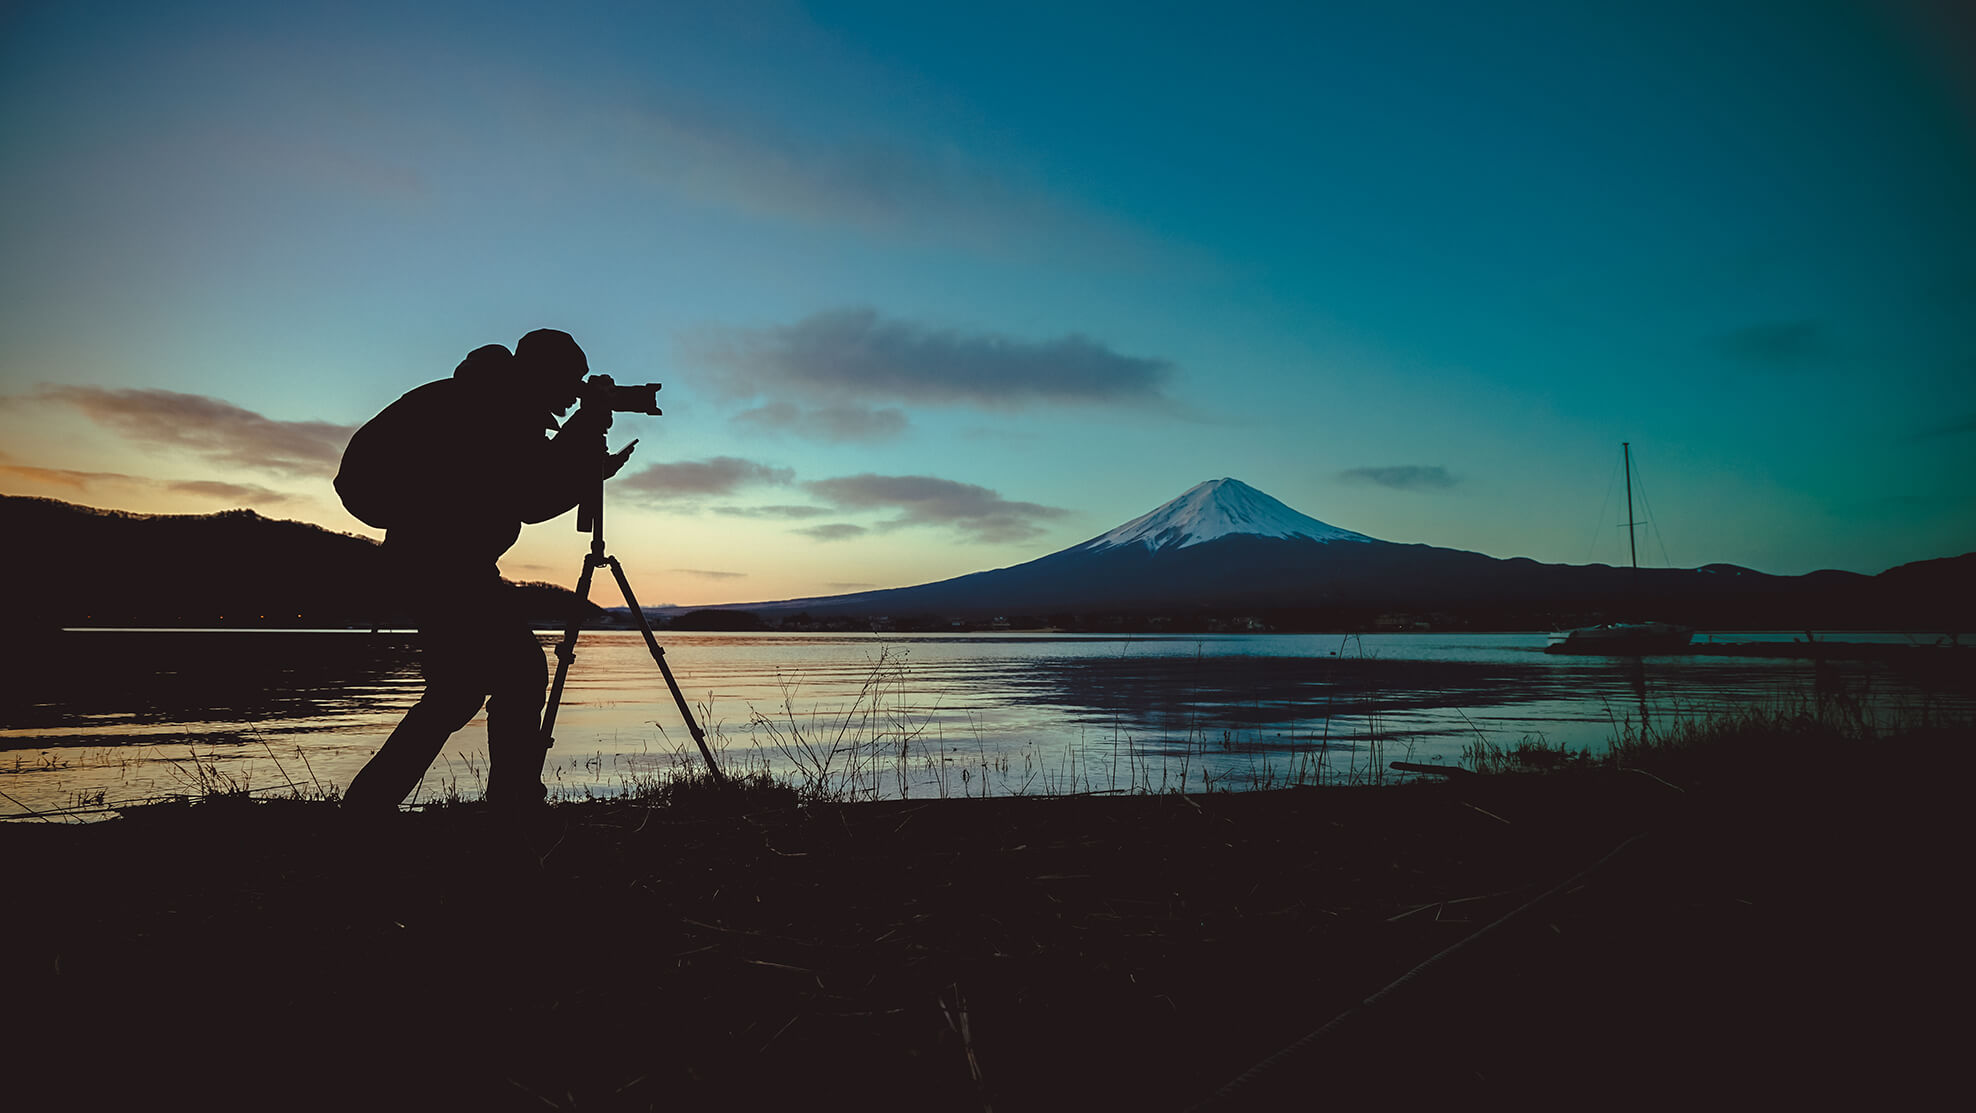 Shutterstock Images License key